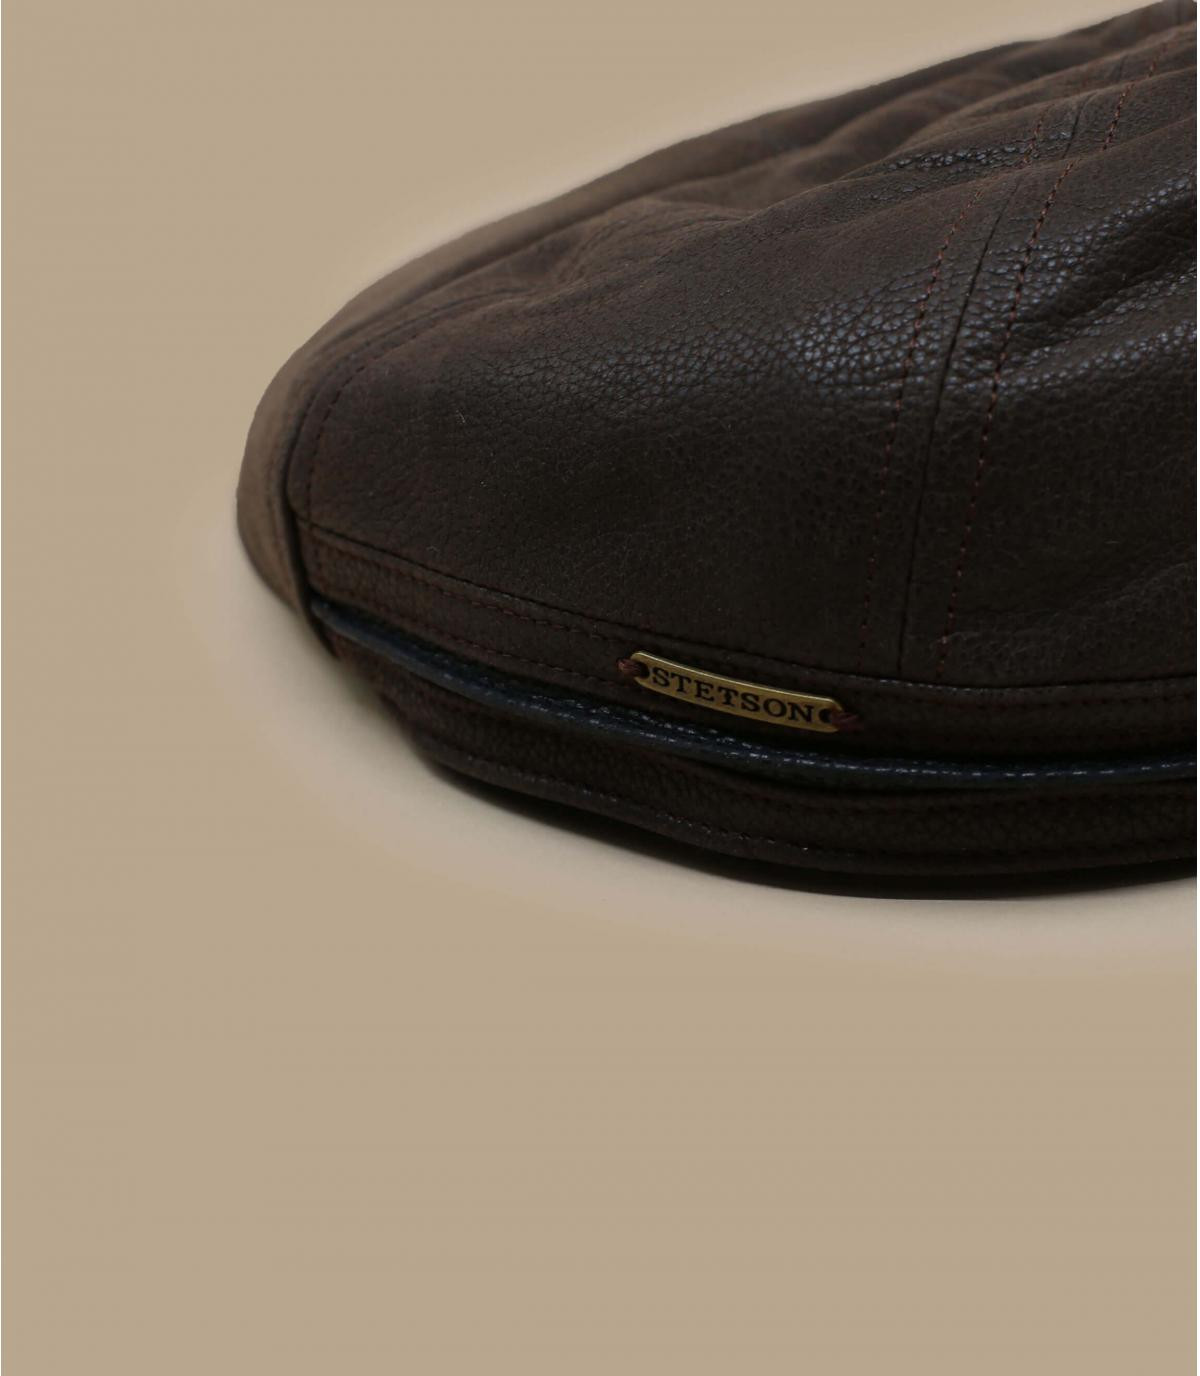 Gorra plate Stetson marrón